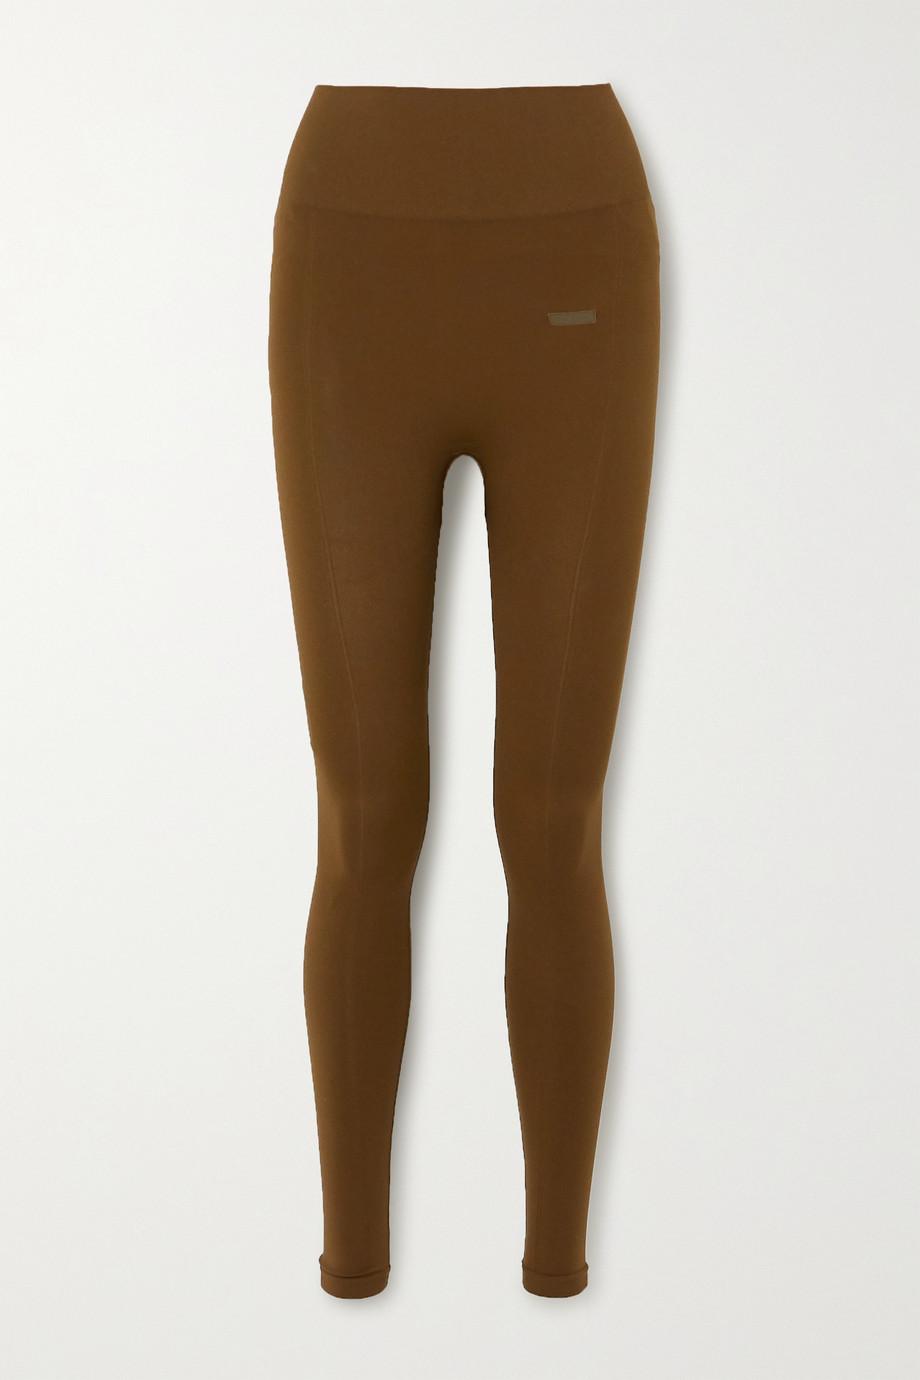 Vaara Jules stretch leggings